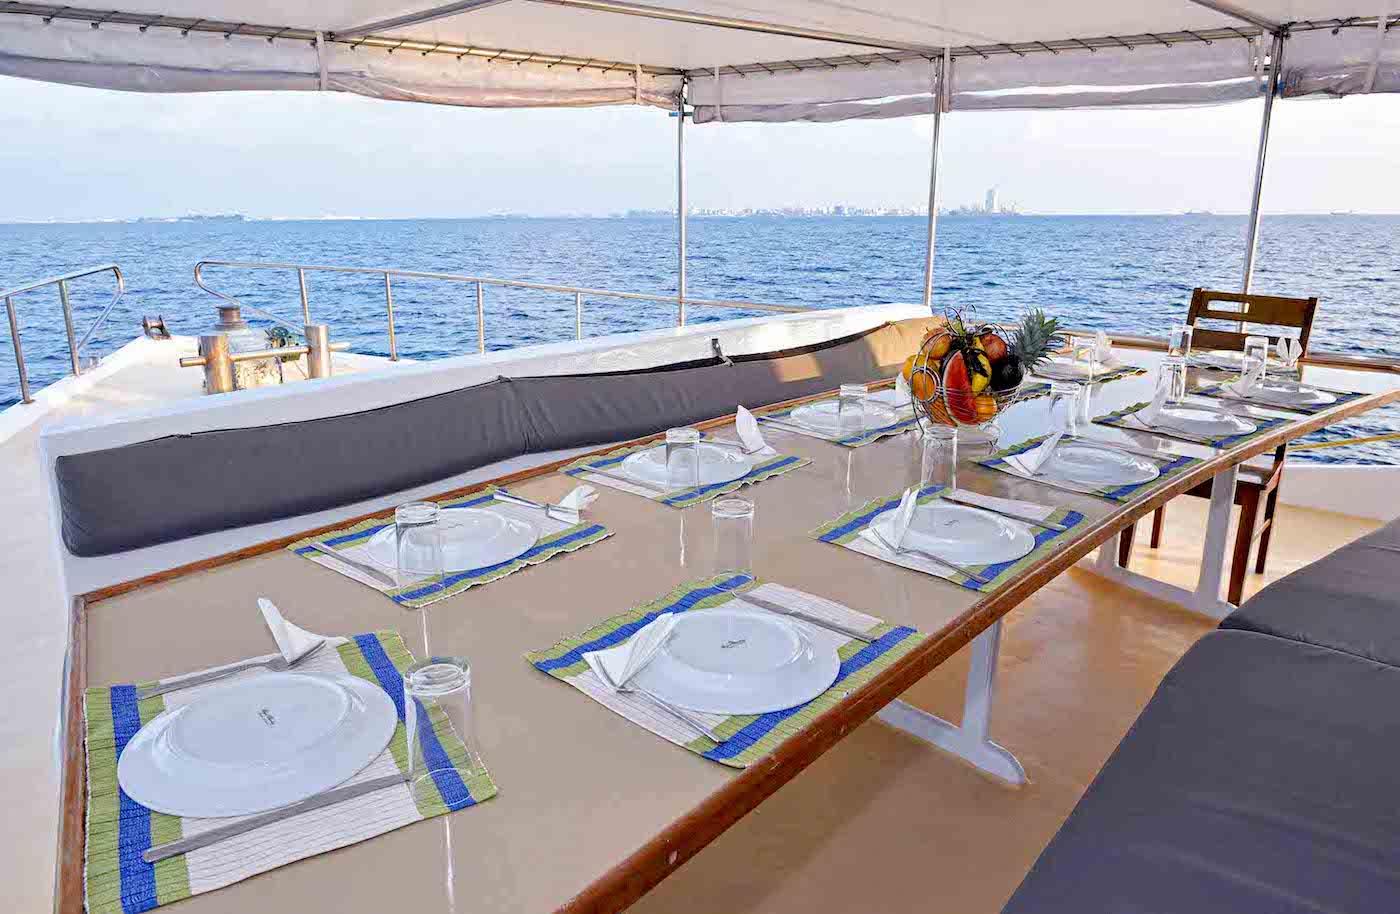 Blue Horizon 2 Surf Charter Boat Maldives  Dining